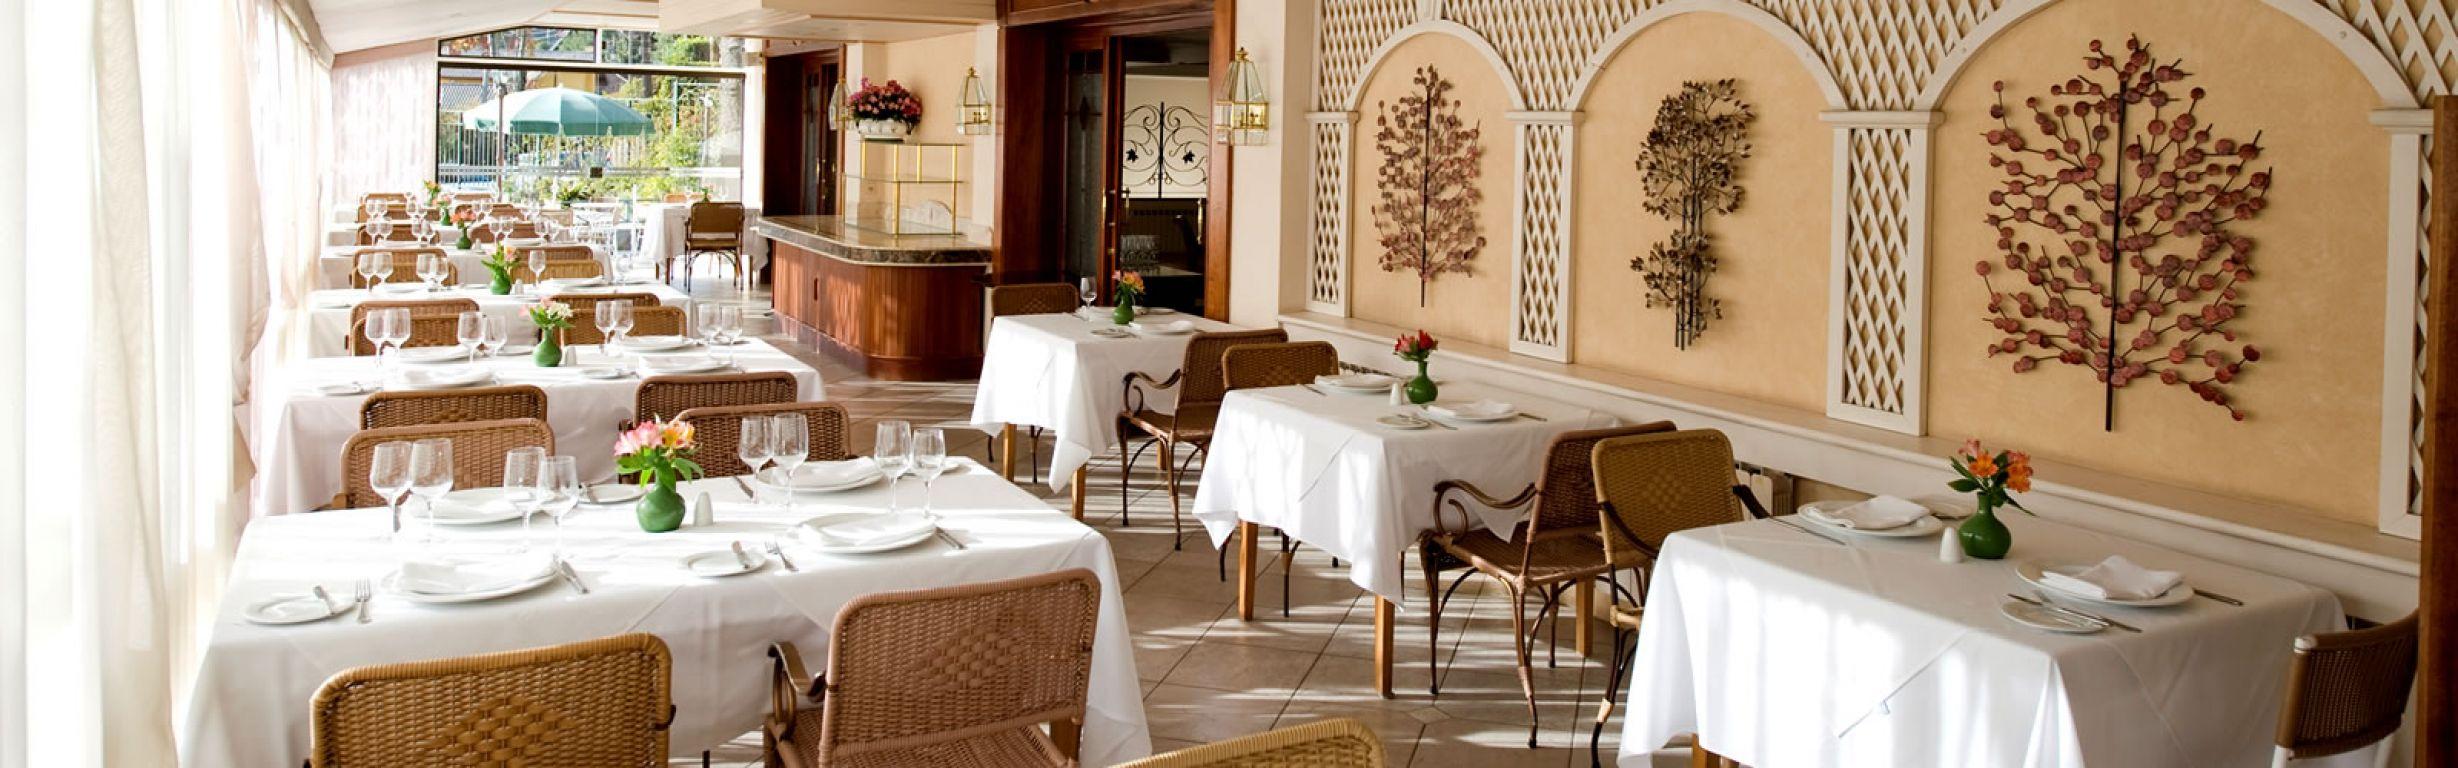 Dica gastronômica da semana: Restaurante Charpentier